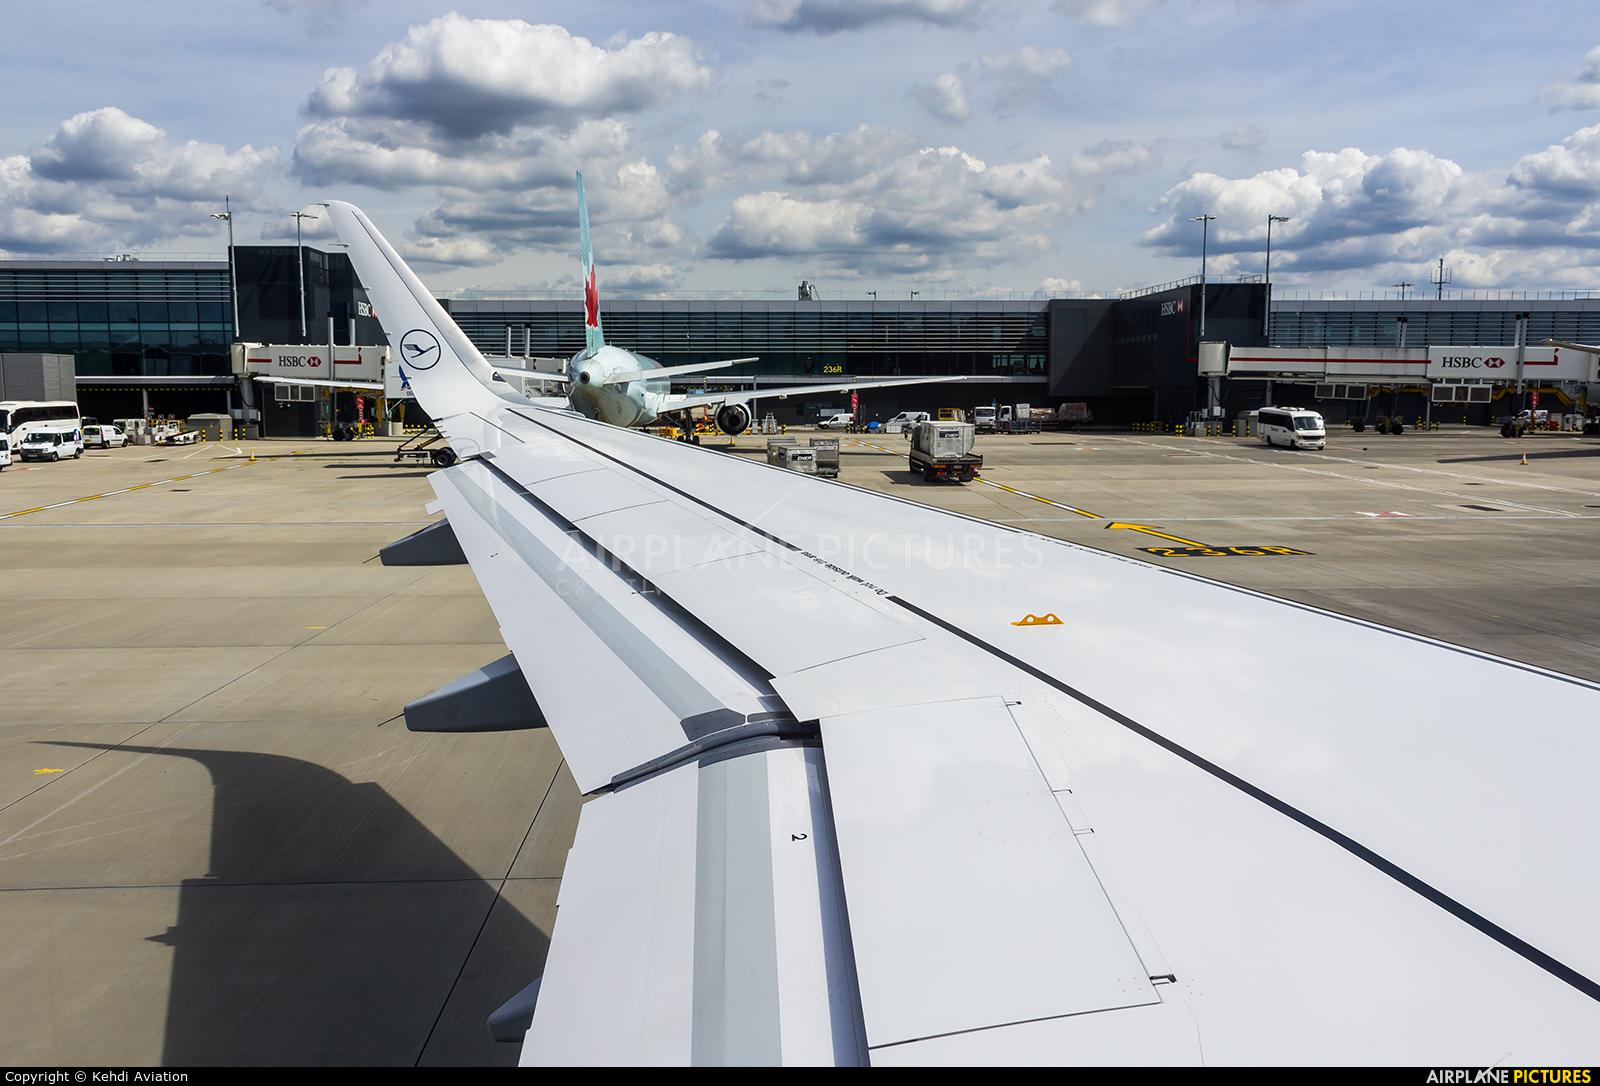 Lufthansa D-AIUU aircraft at London - Heathrow